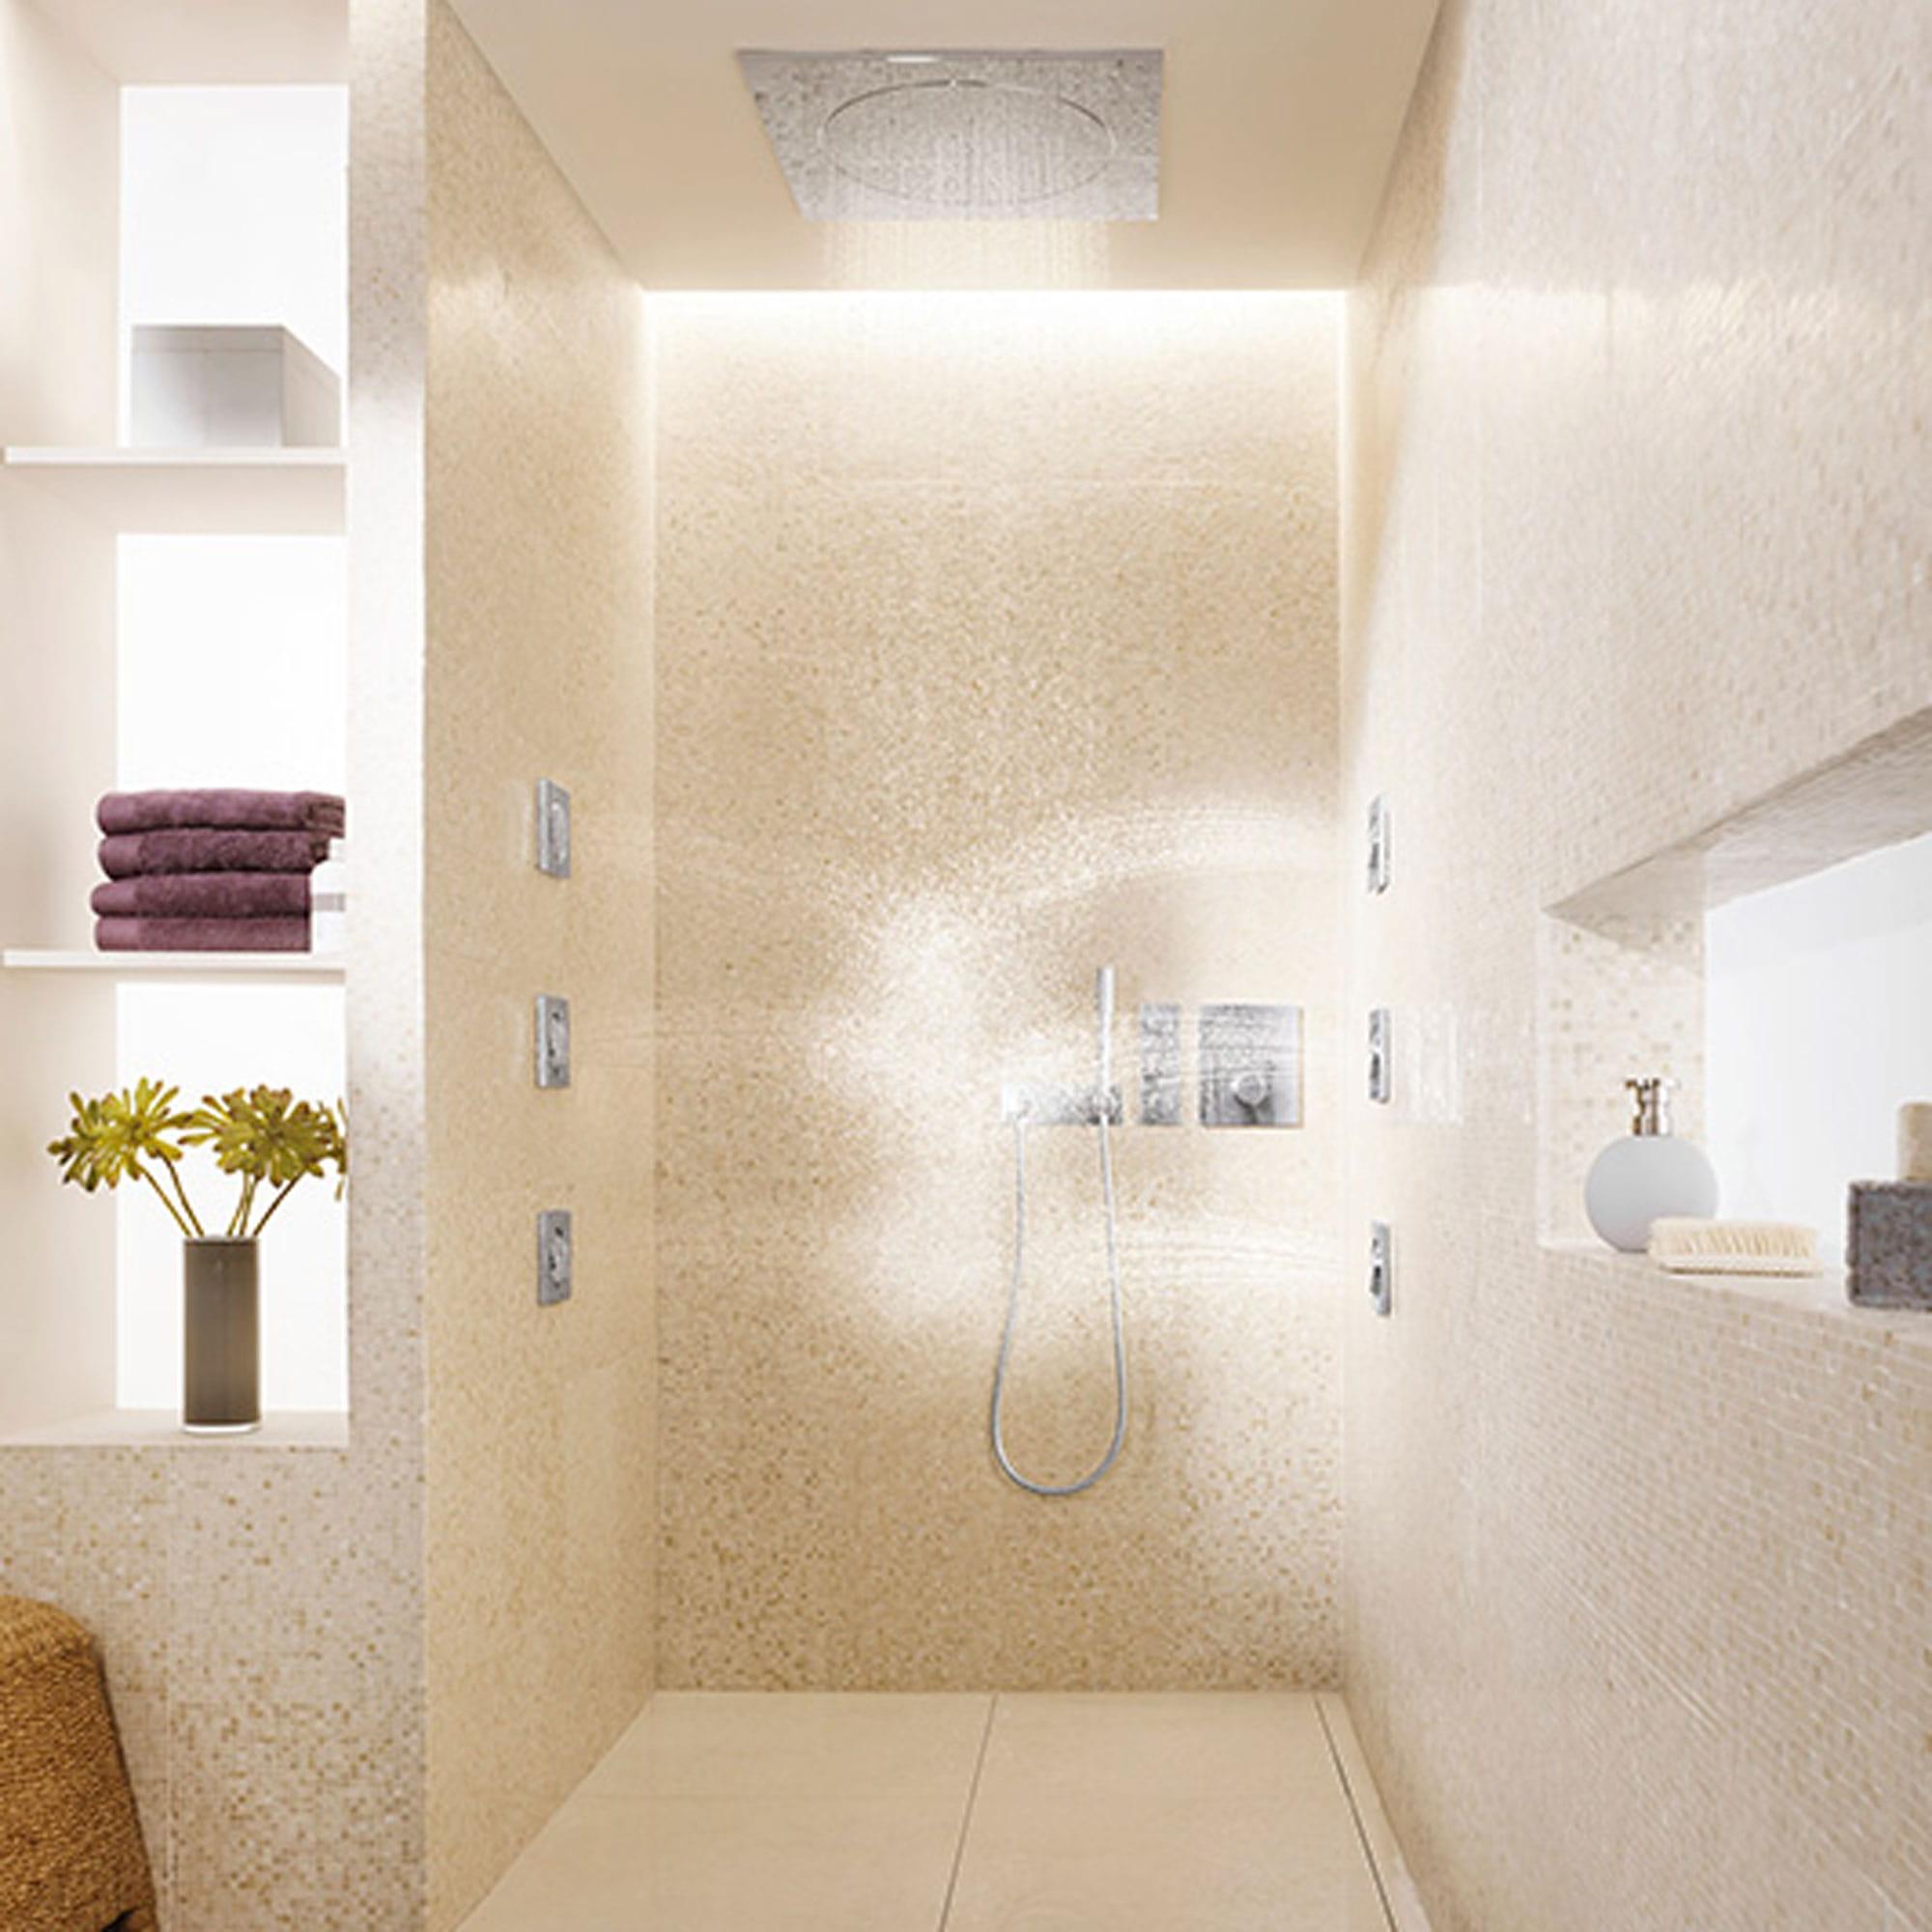 Bathroom shower with wall spray jets and rain showerhead